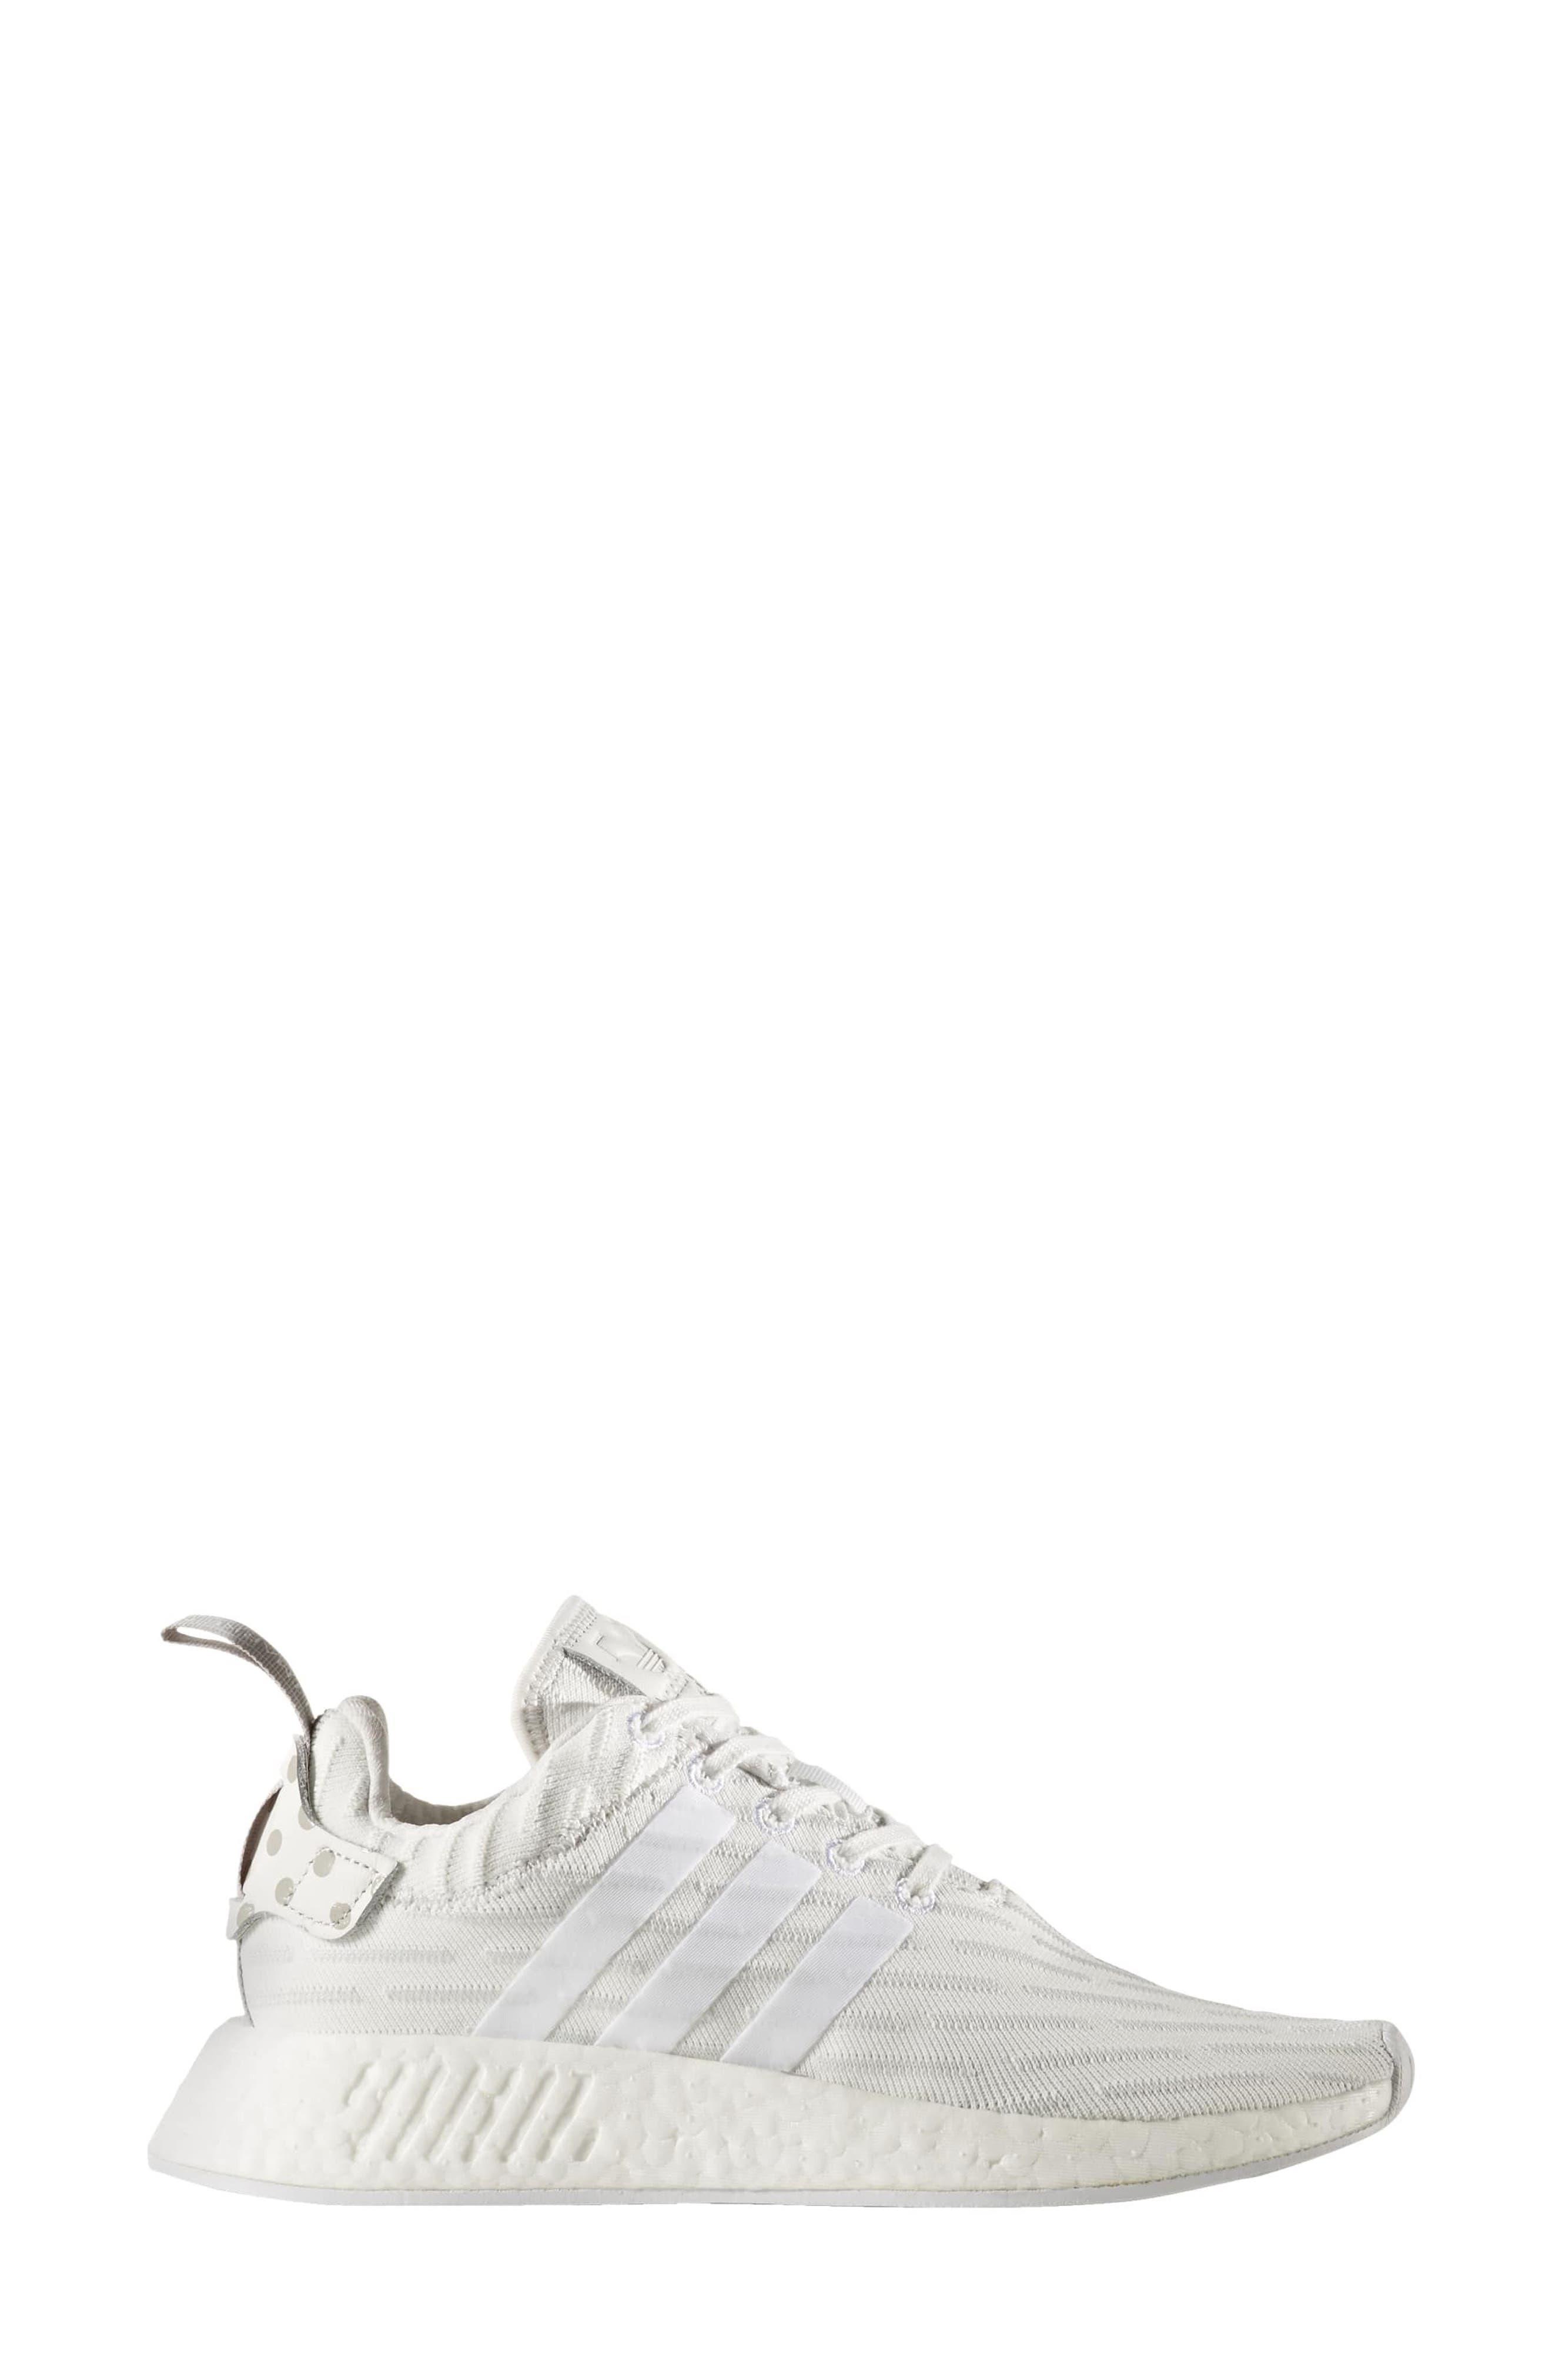 adidas NMD R2 Running Shoe (Women)